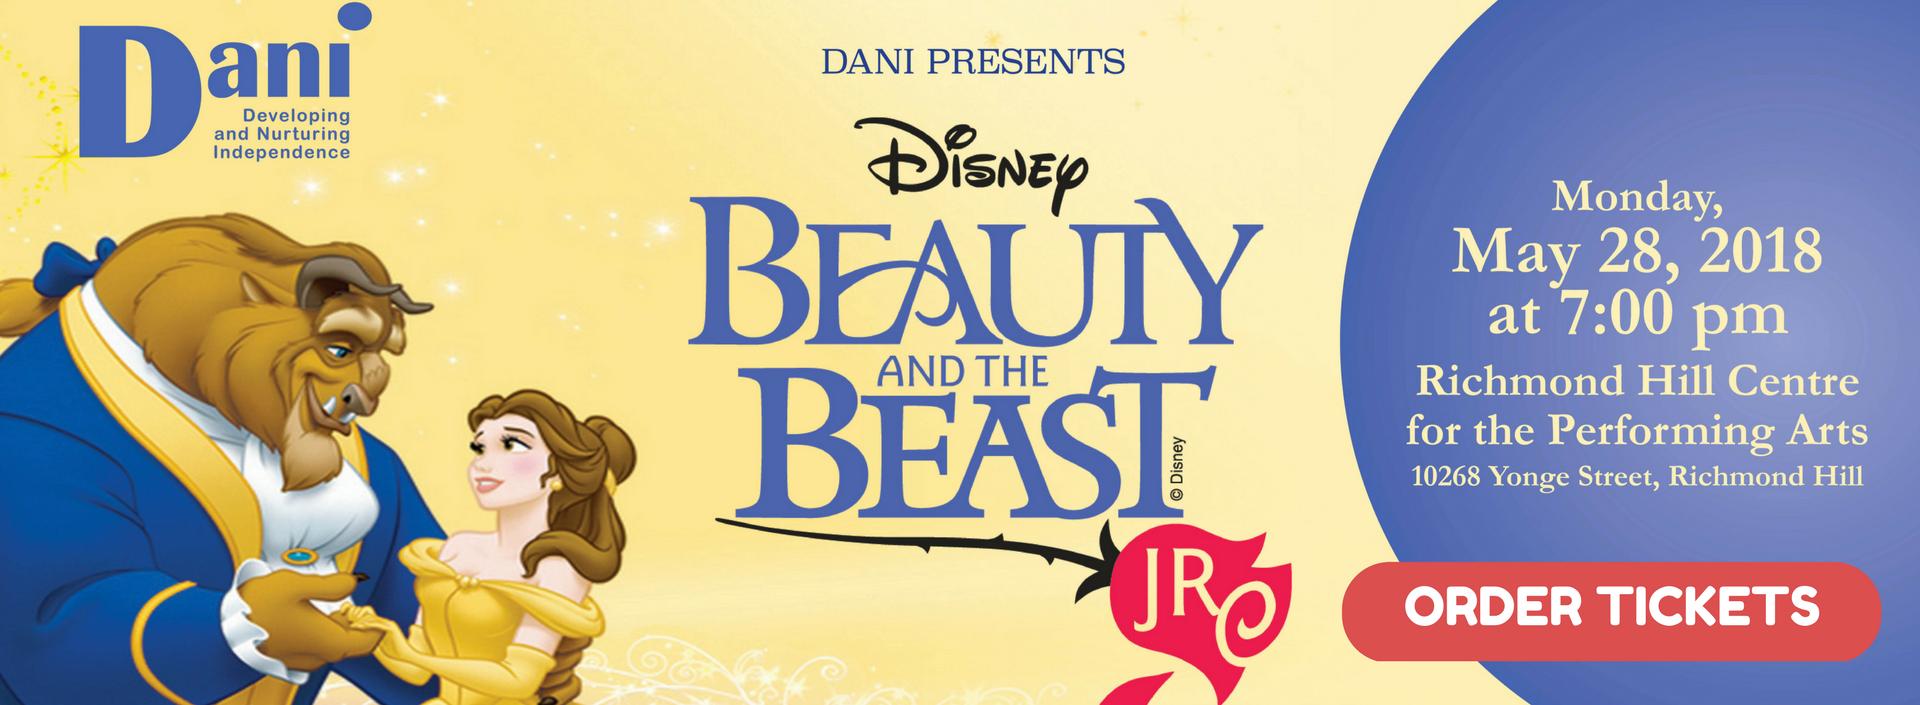 DANI Presents: Disney's Beauty and the Beast Jr.